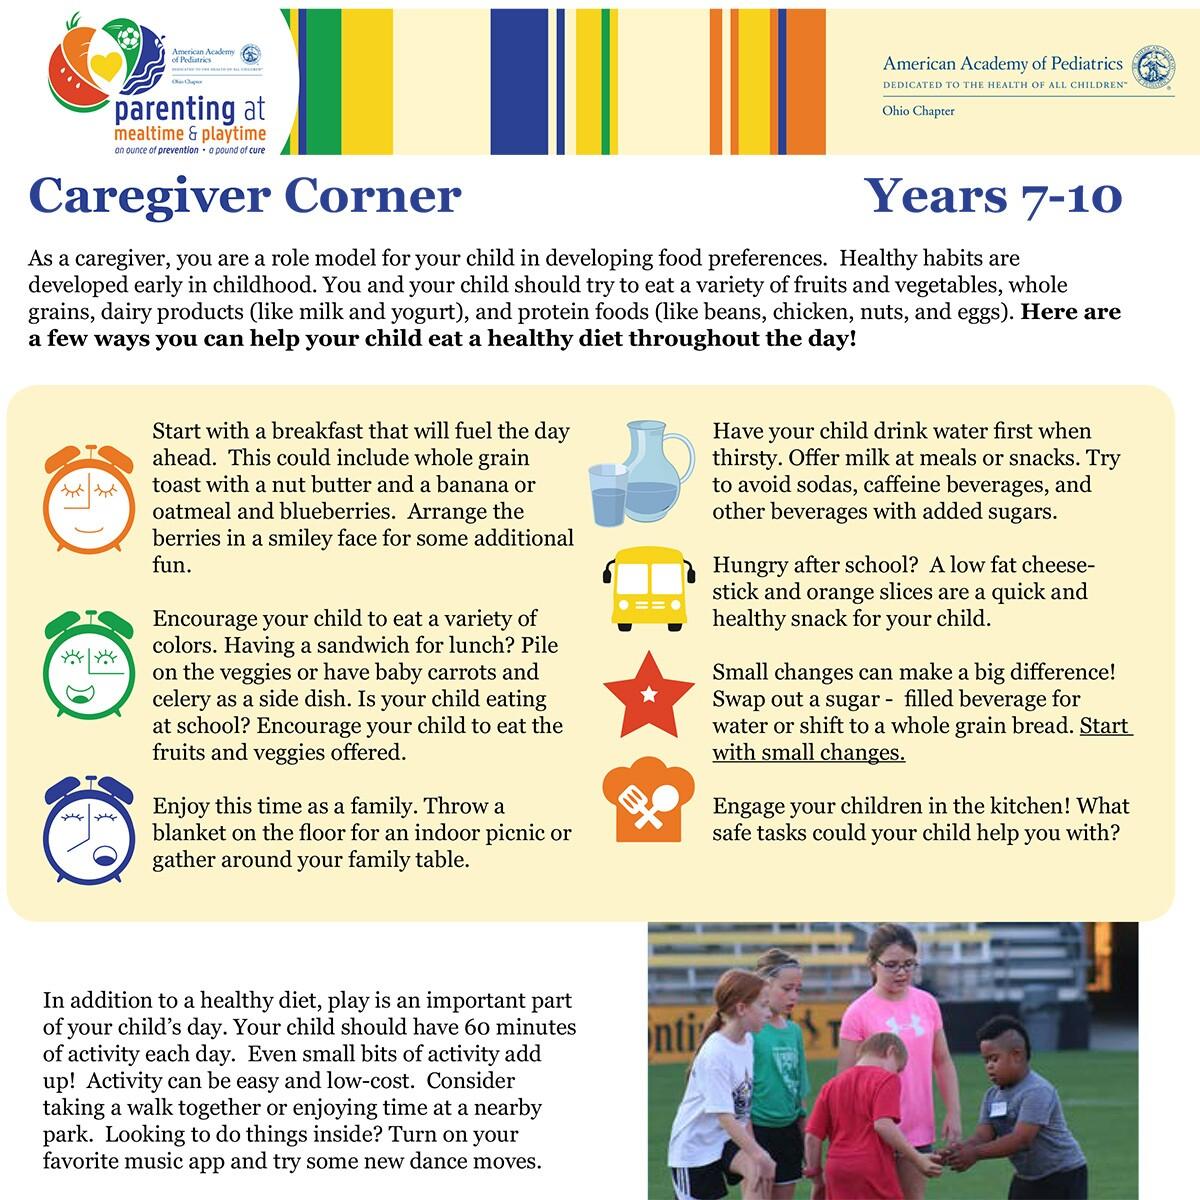 American Academy of Pediatrics, Ohio Department of Health - Caregiver Corner Handout, Healthy Habits, Ages 7-10